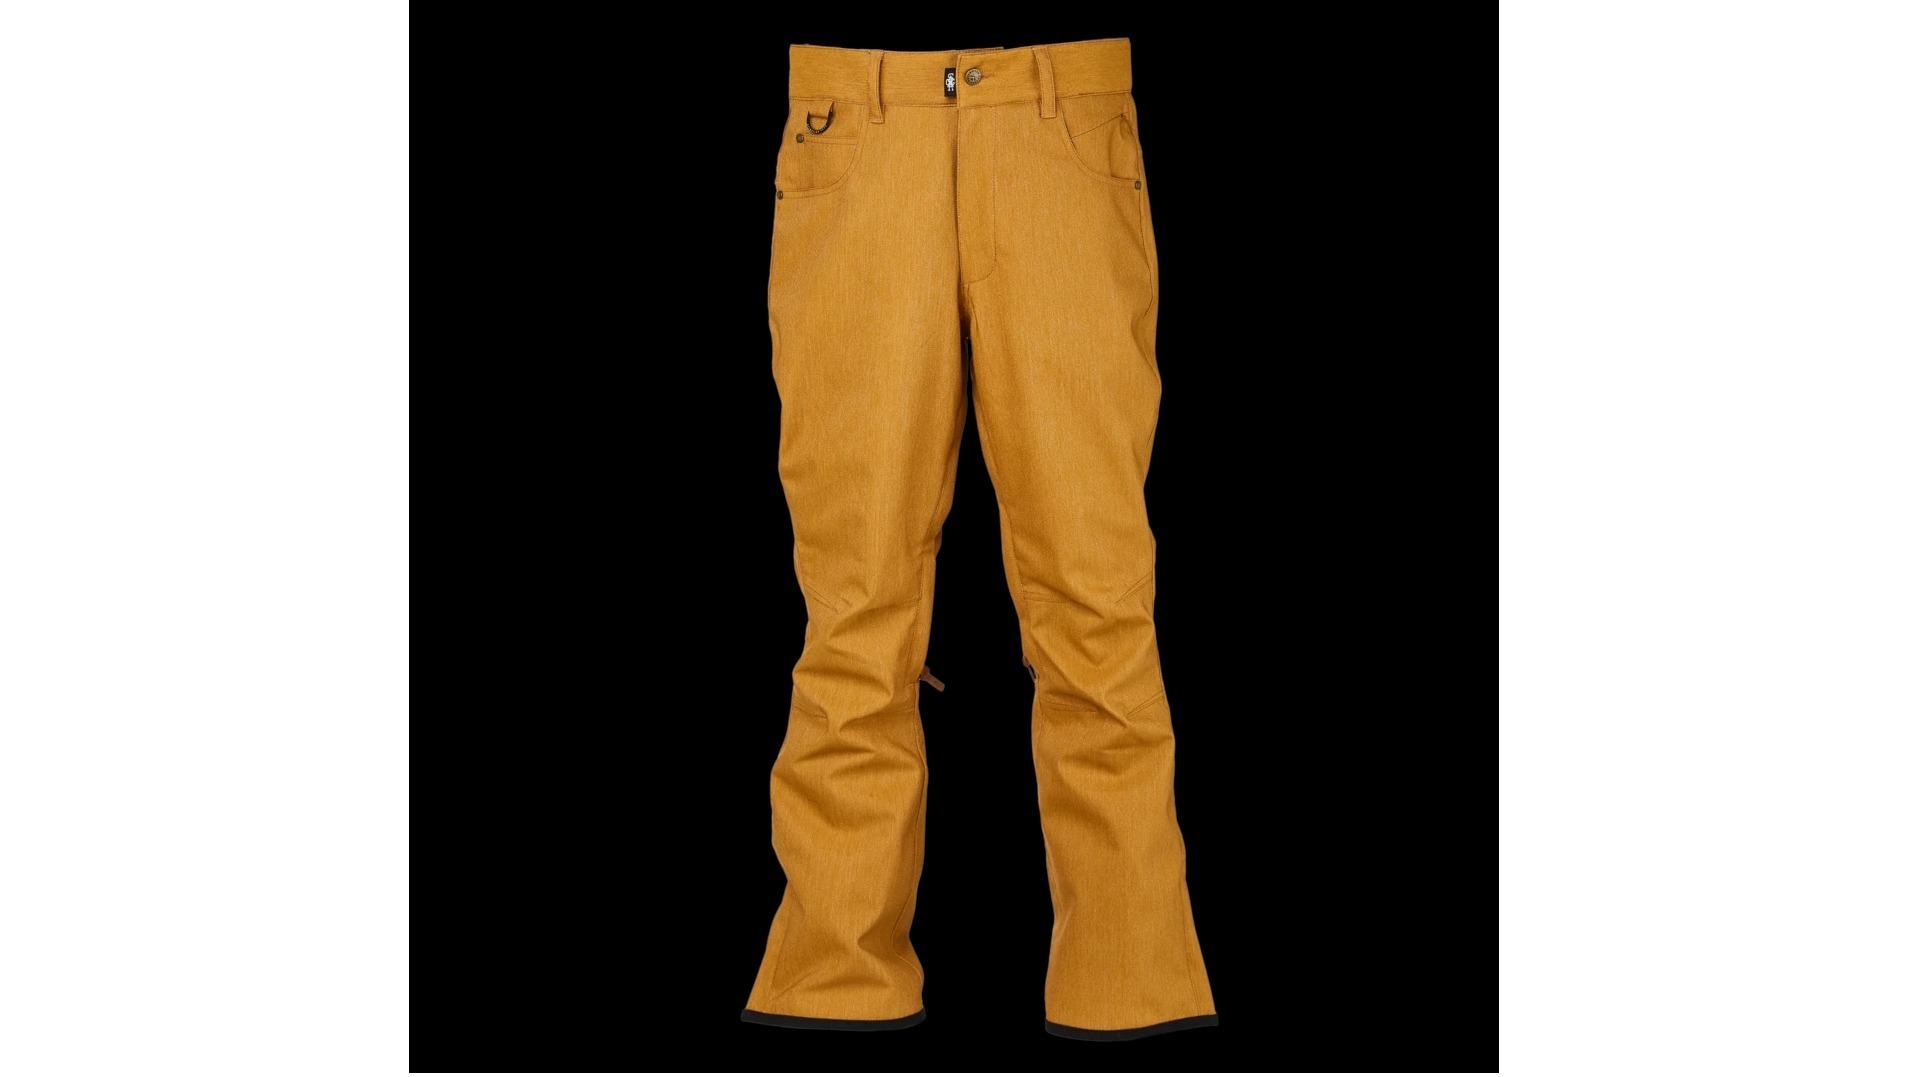 Saga Outerwear Brighton Pant   Ski Gear 20   Newschoolers.com